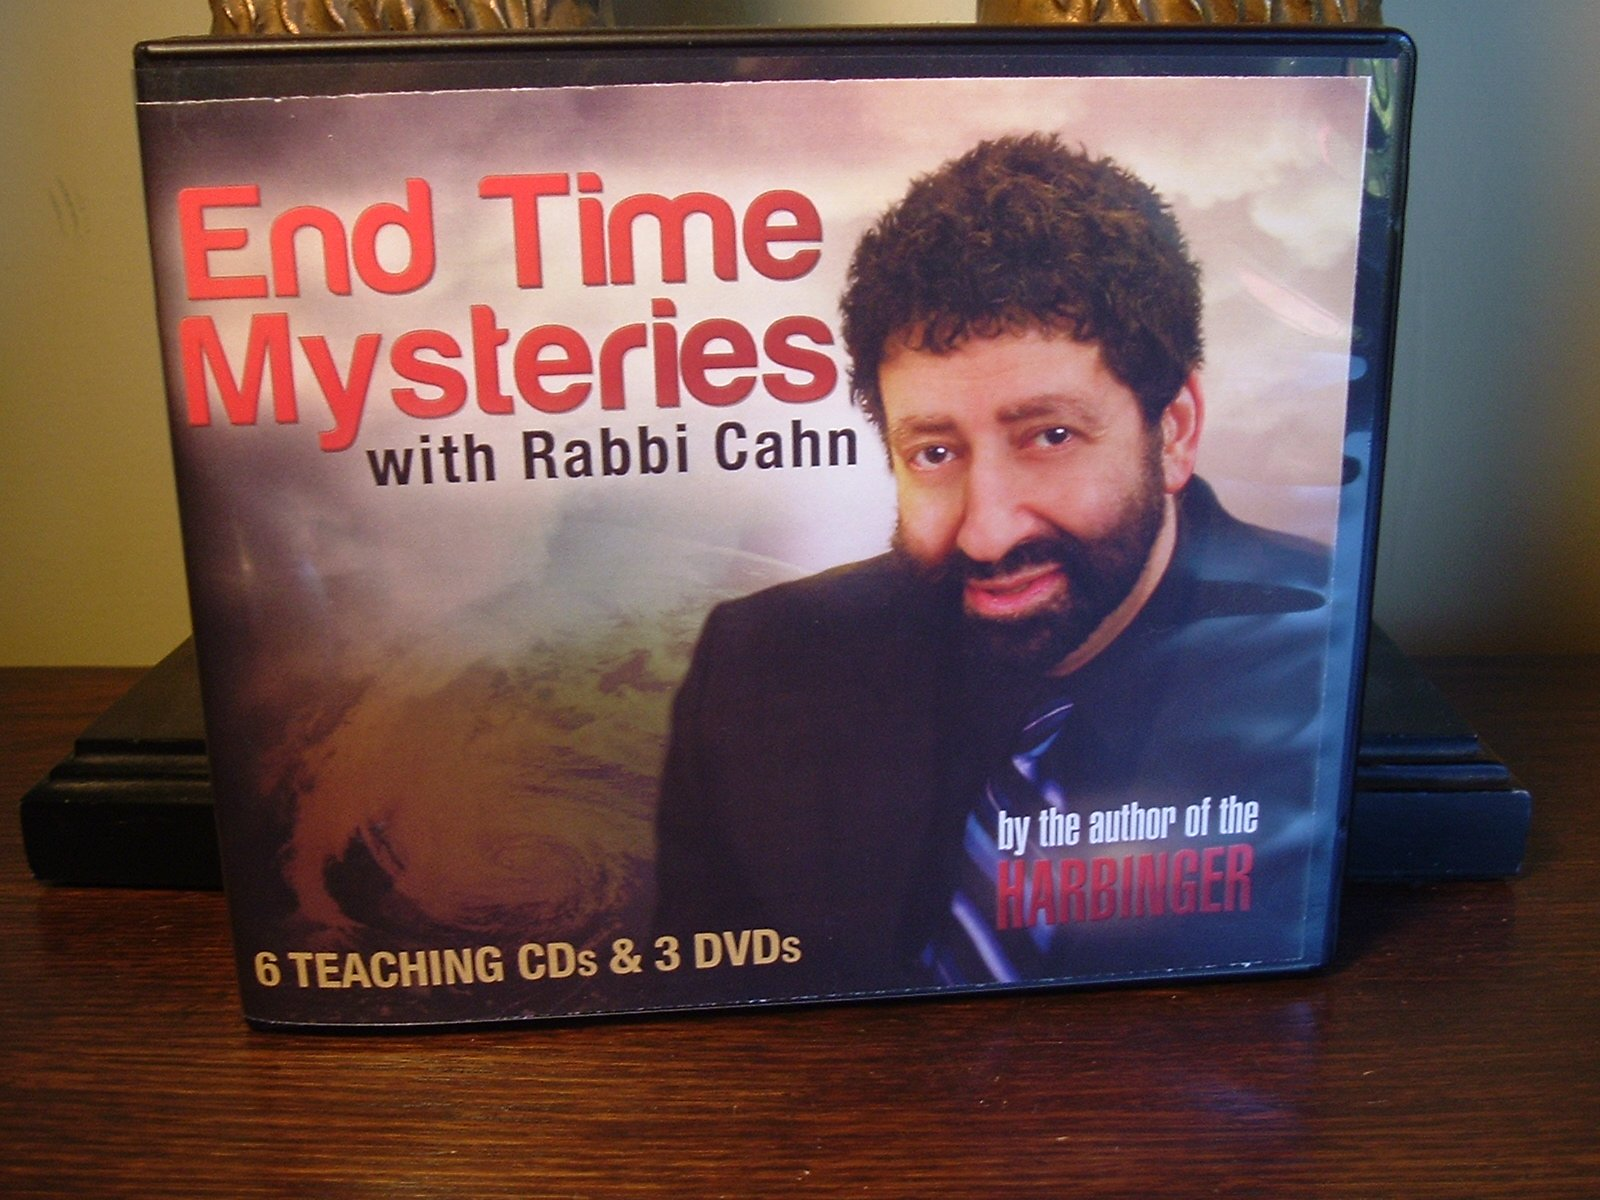 End time mysteries with rabbi jonathan cahn 6 teaching cds and 3 end time mysteries with rabbi jonathan cahn 6 teaching cds and 3 dvds boxed set jonathan cahn amazon books malvernweather Images